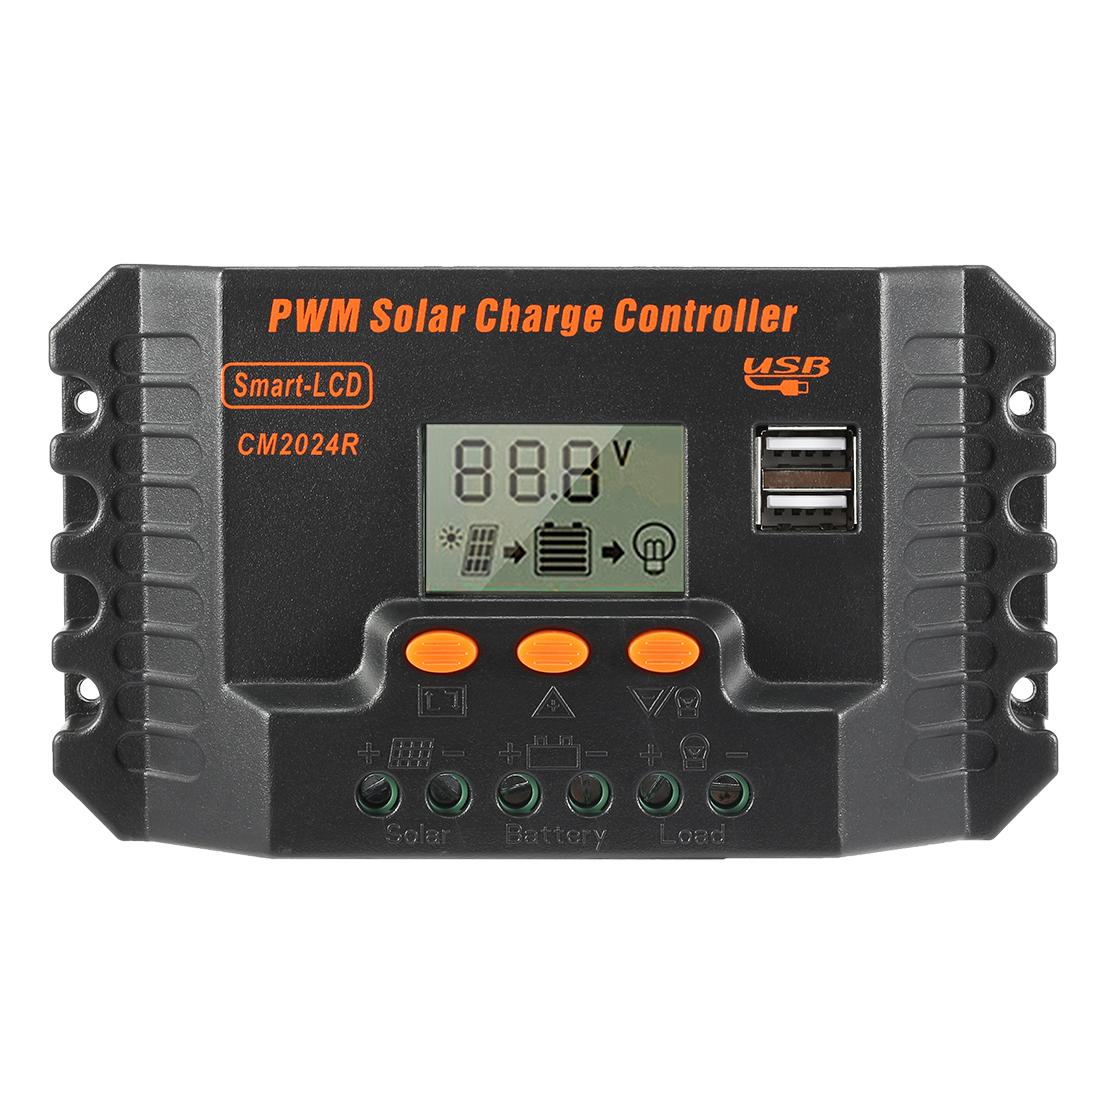 Intelligent 20A PWM Solar Panel Charge Controller 12V-24V Battery Regulator CM2024R